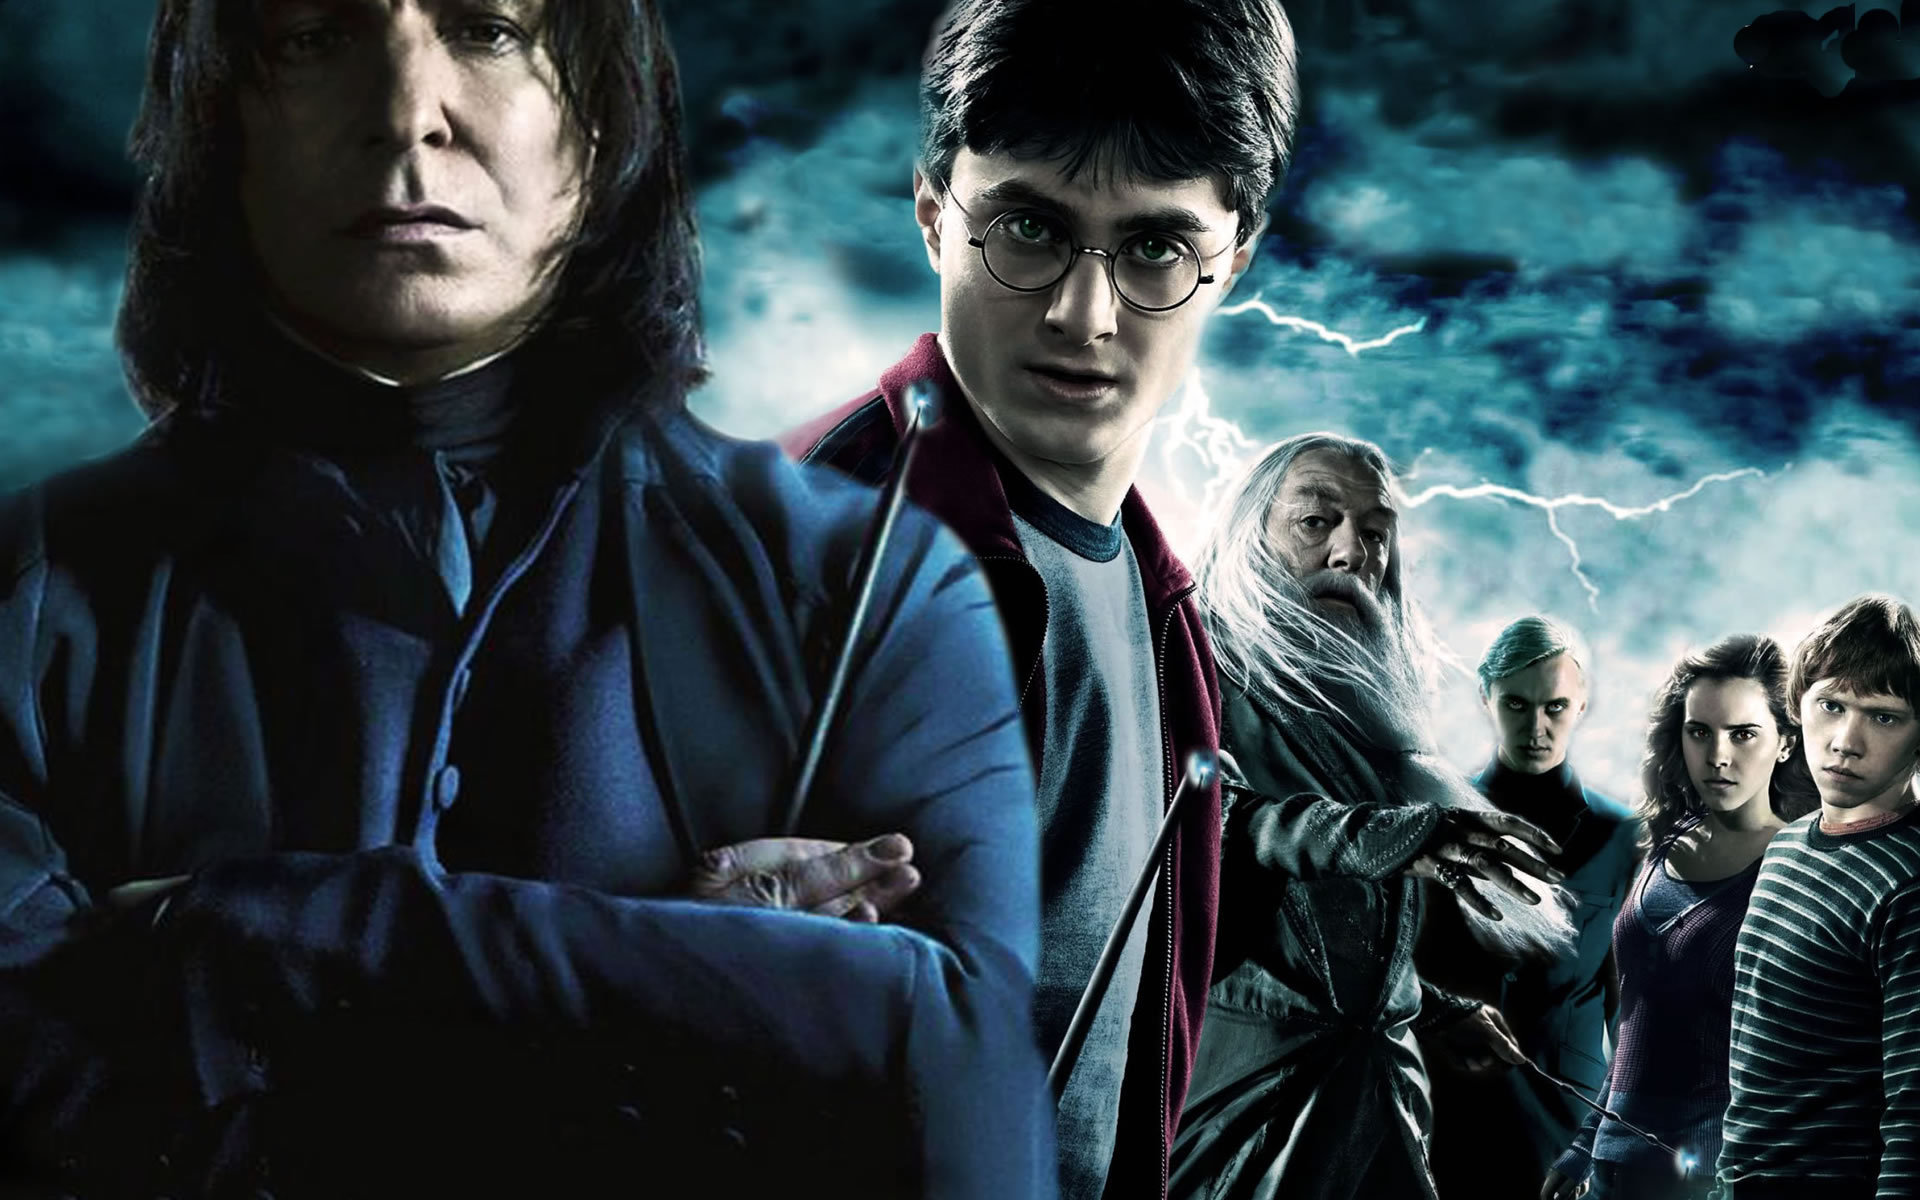 Severus Snape / The Half-Blood Prince